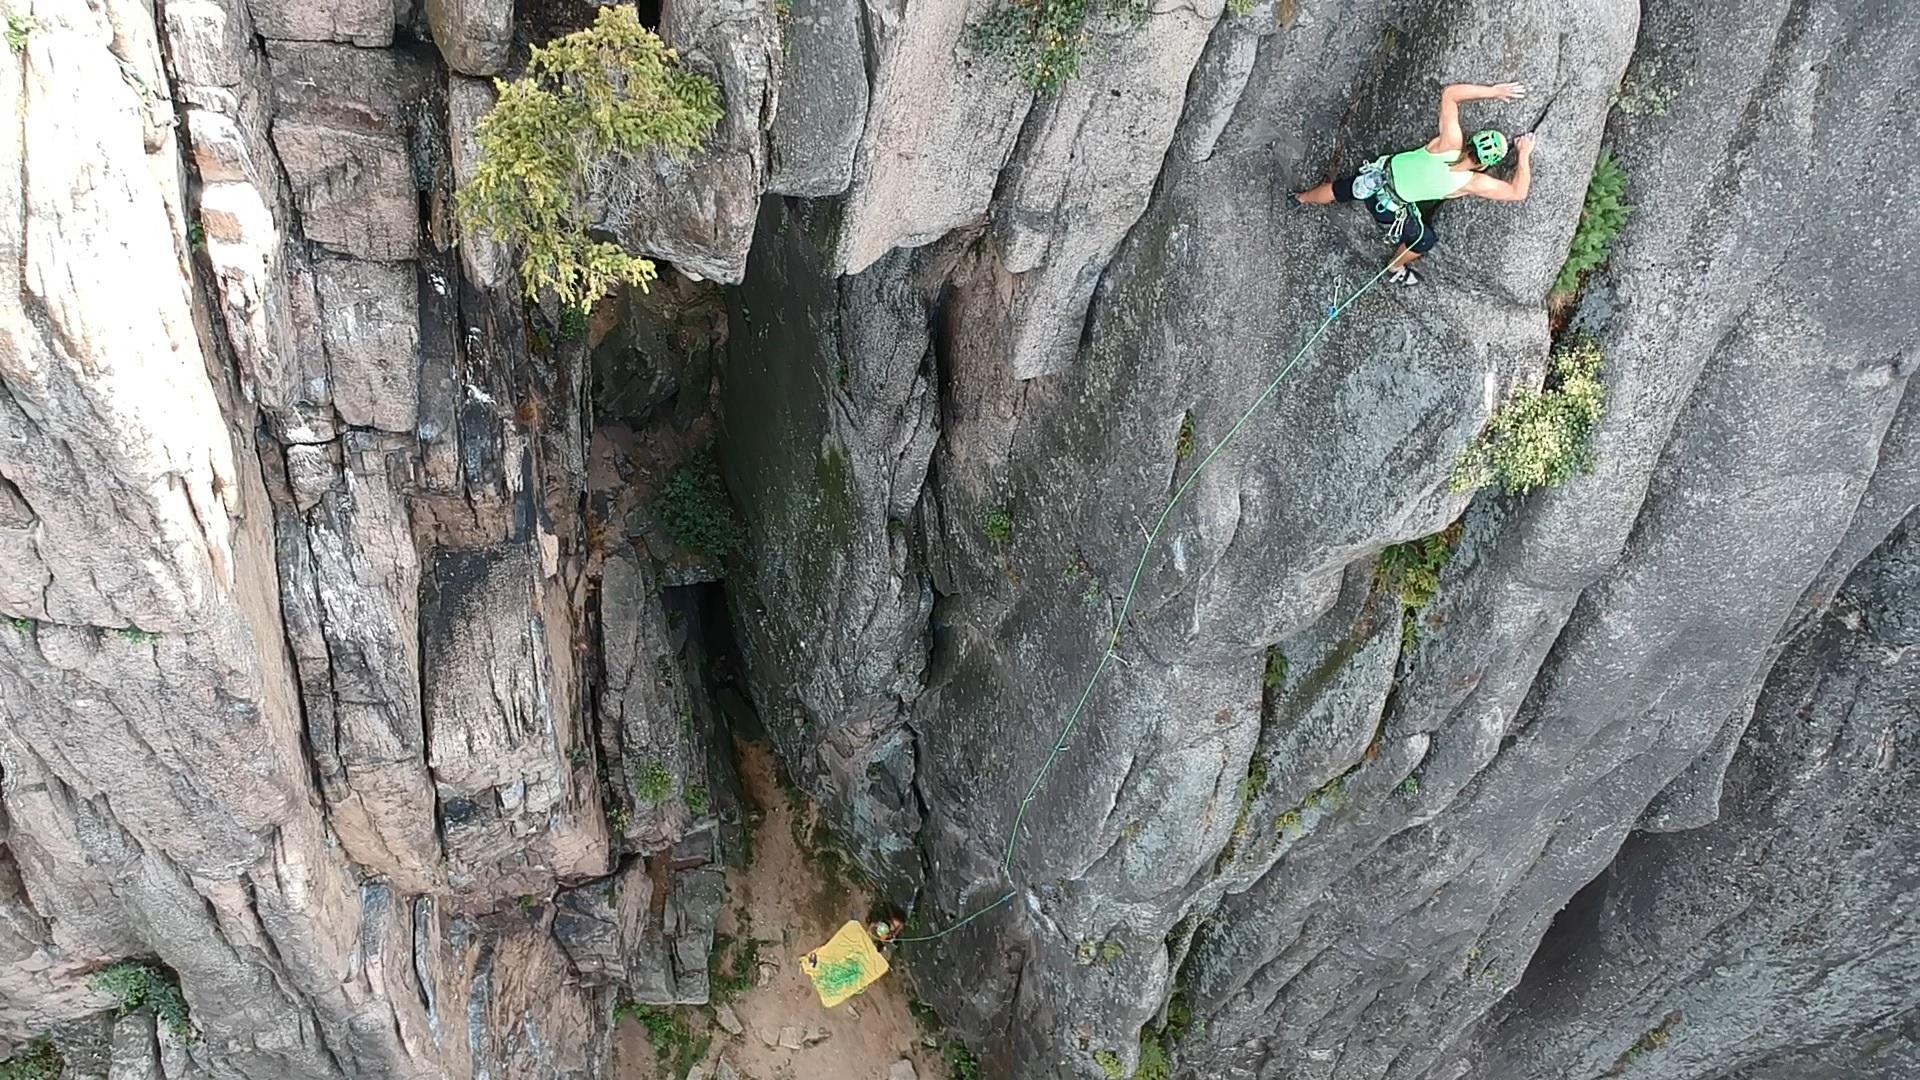 Adam Bieecki sport climbing at a local crag in Poland